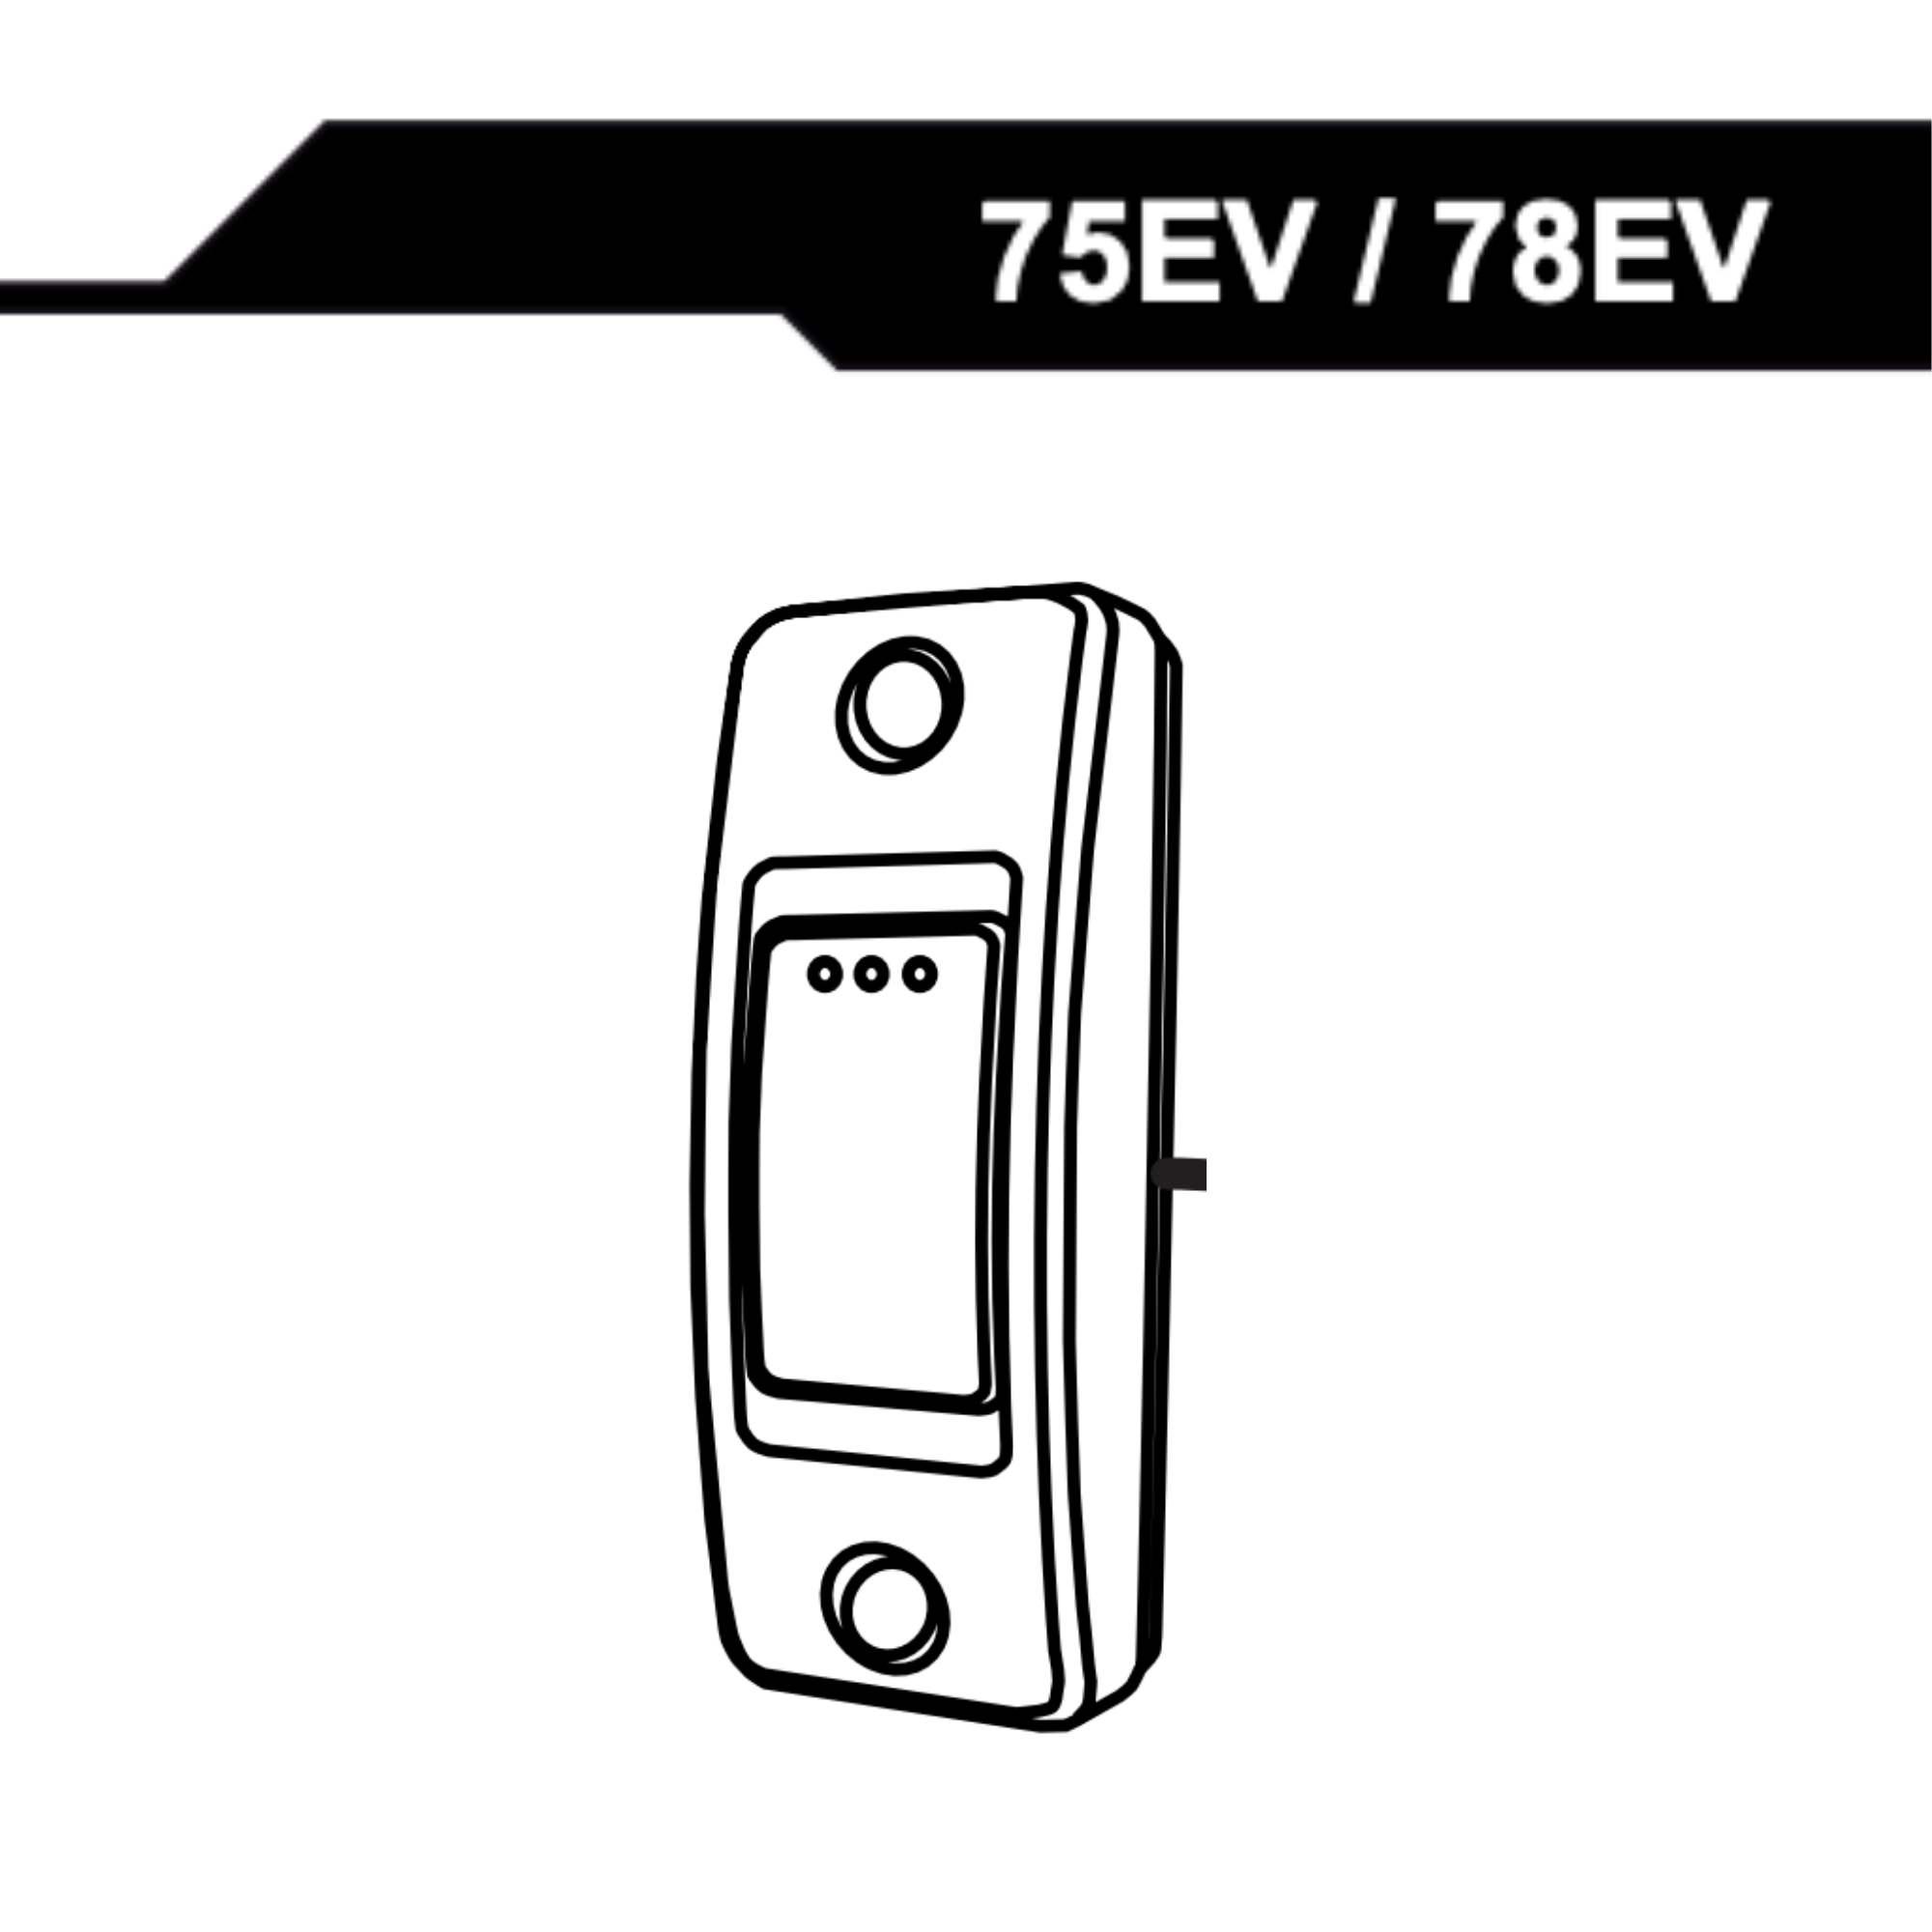 Manual for 75EV/78EV veggbryter